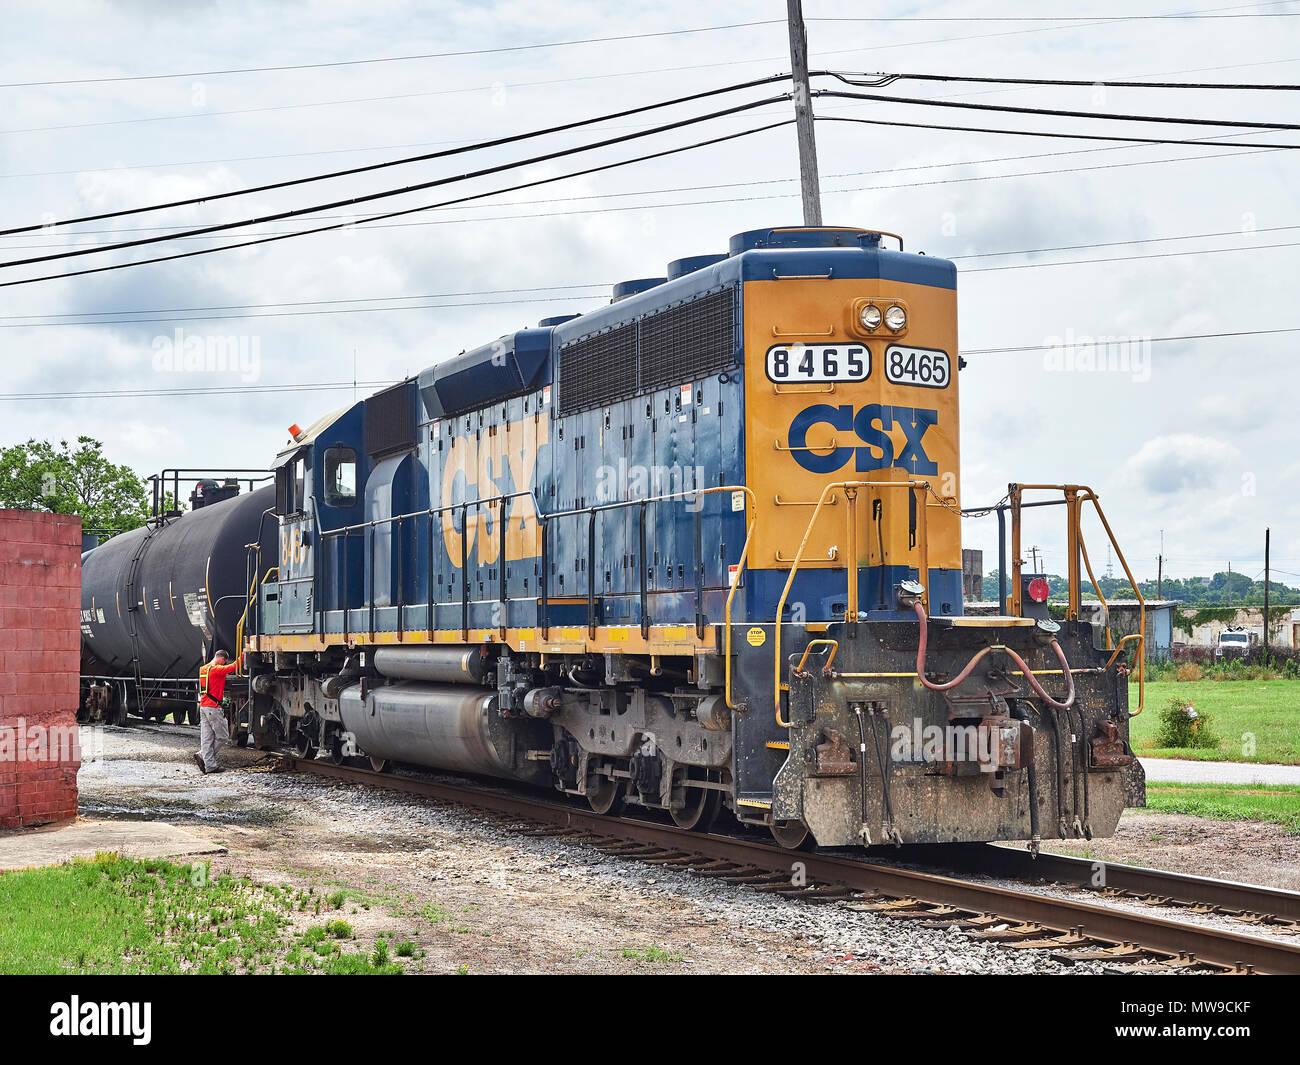 CSX Transportation locomotive, EMD SD40-2, #8465, in switching yard pushing freight cars, in Montgomery Alabama, USA. - Stock Image